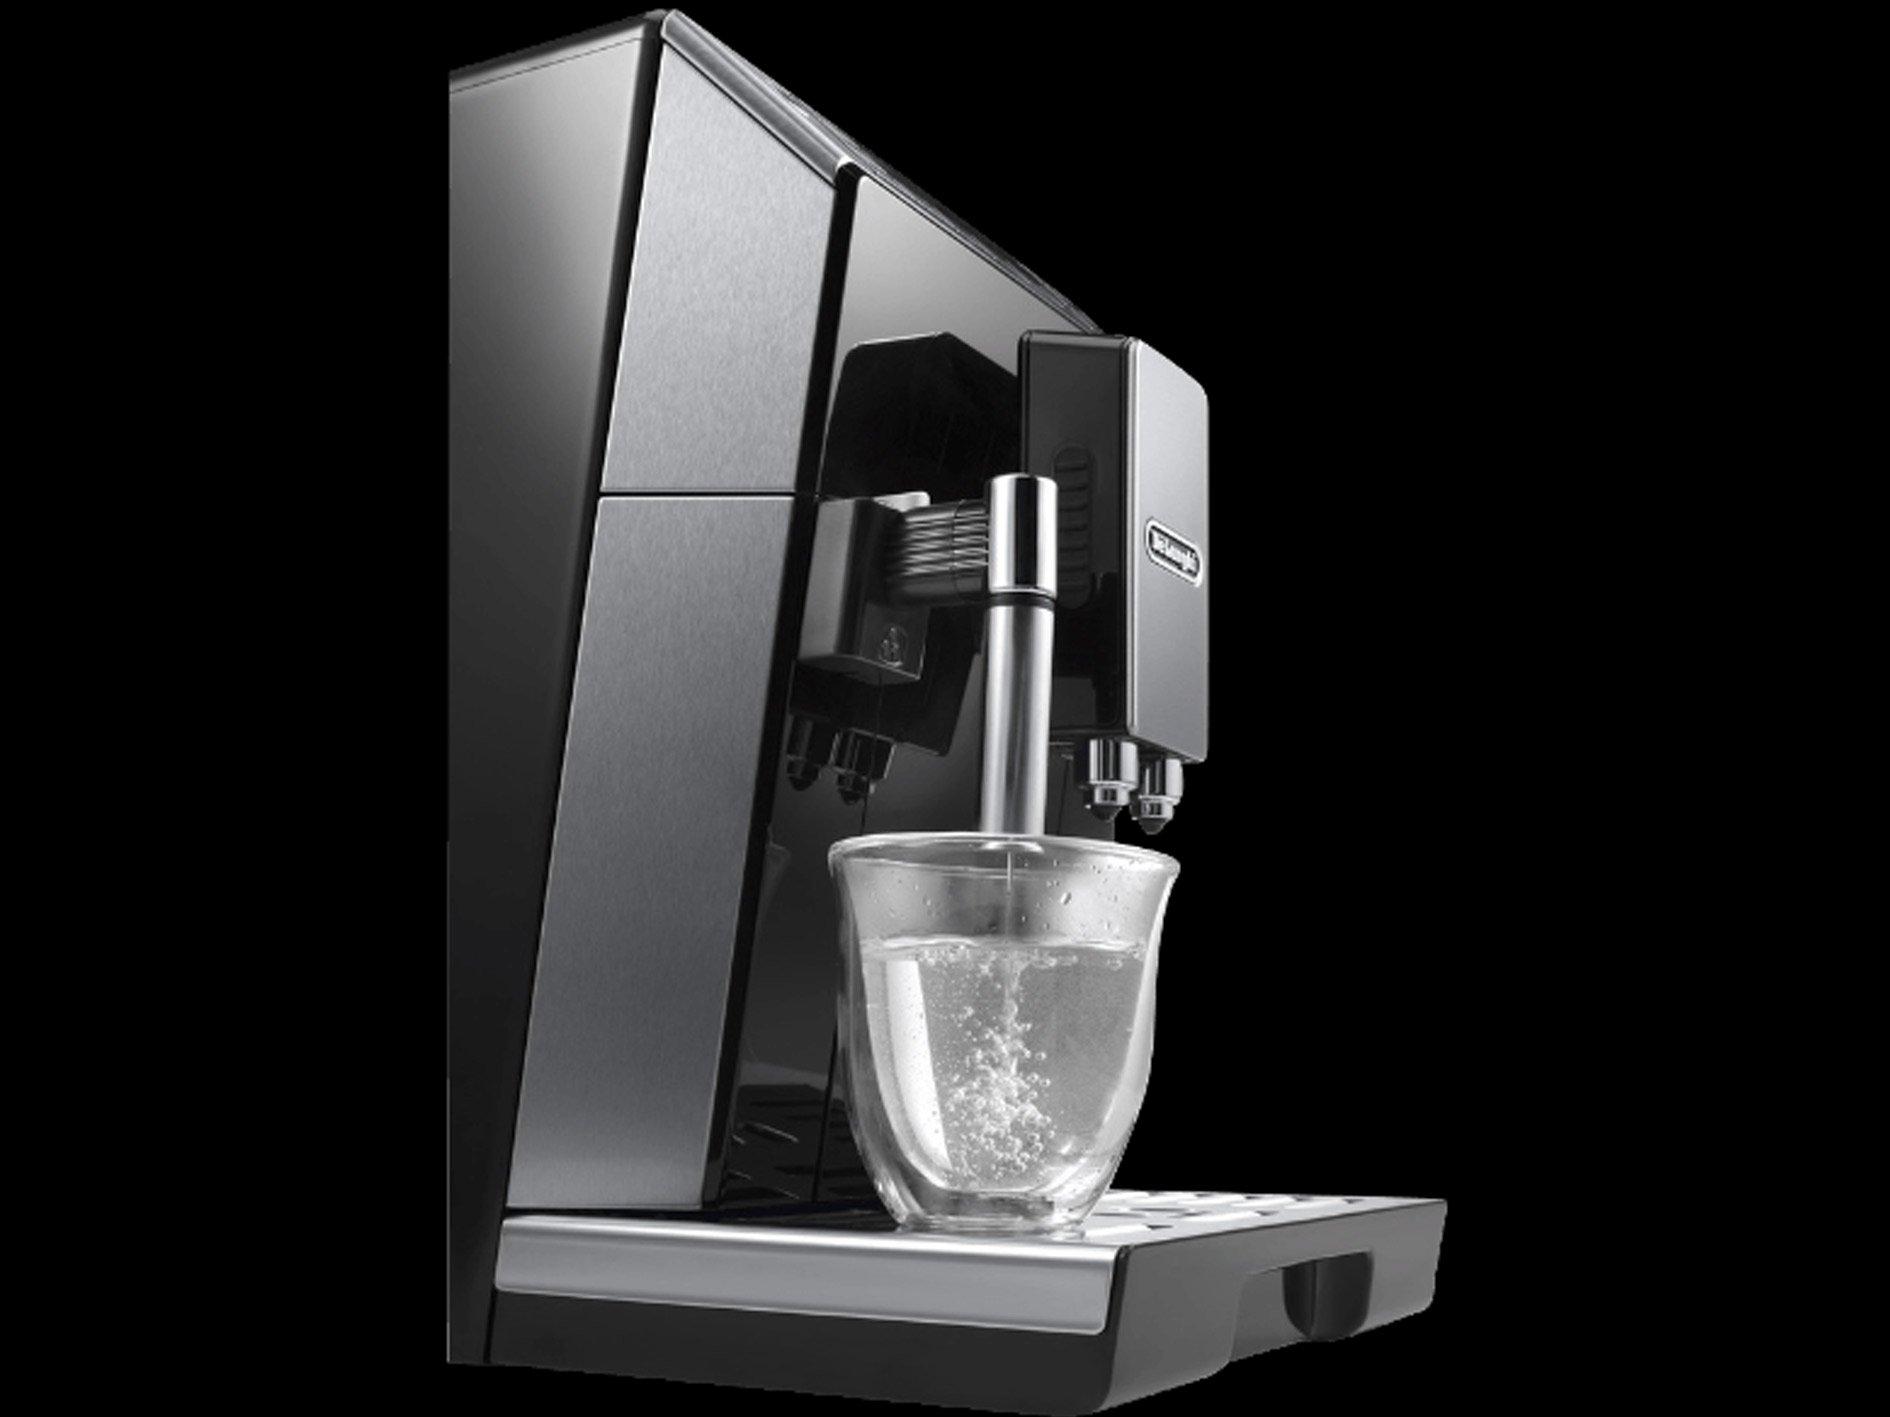 DeLonghi-ECAM-45766W-Kaffeevollautomat-Eletta-Cappuccino-mit-Latte-Crema-Milchaufschumsystem